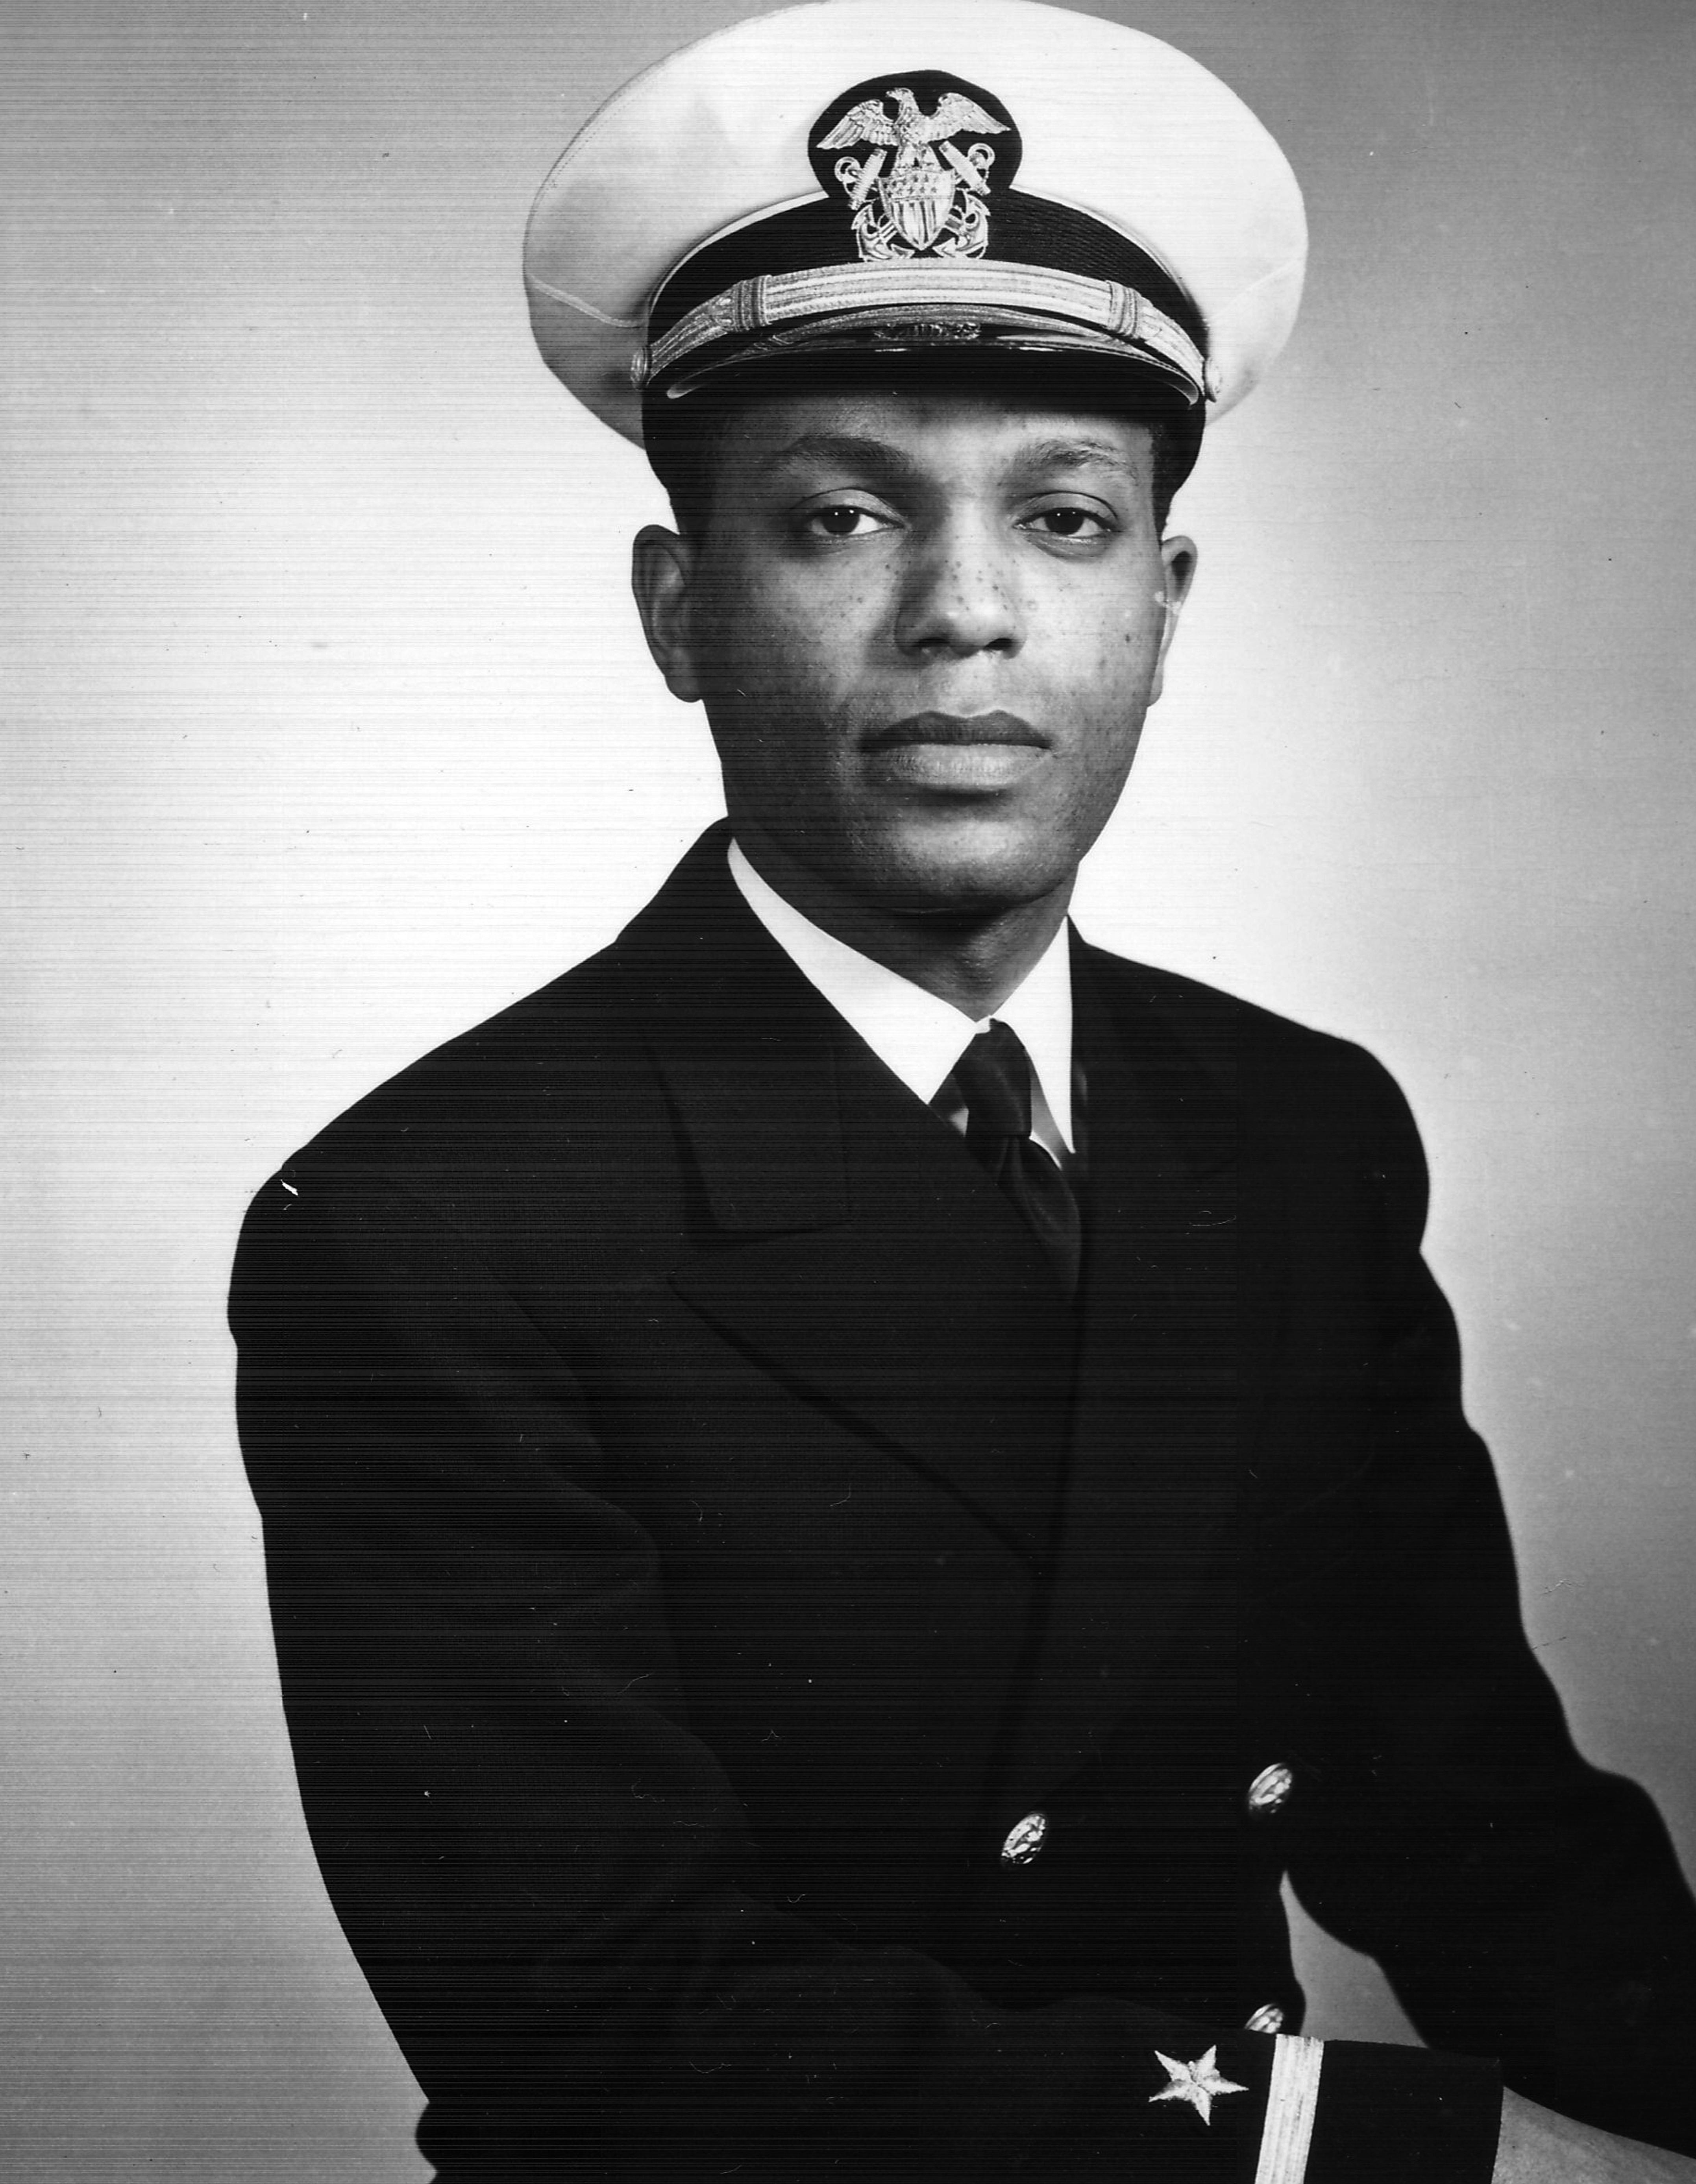 William Sylvester White Jr. in Chicago during World War II.